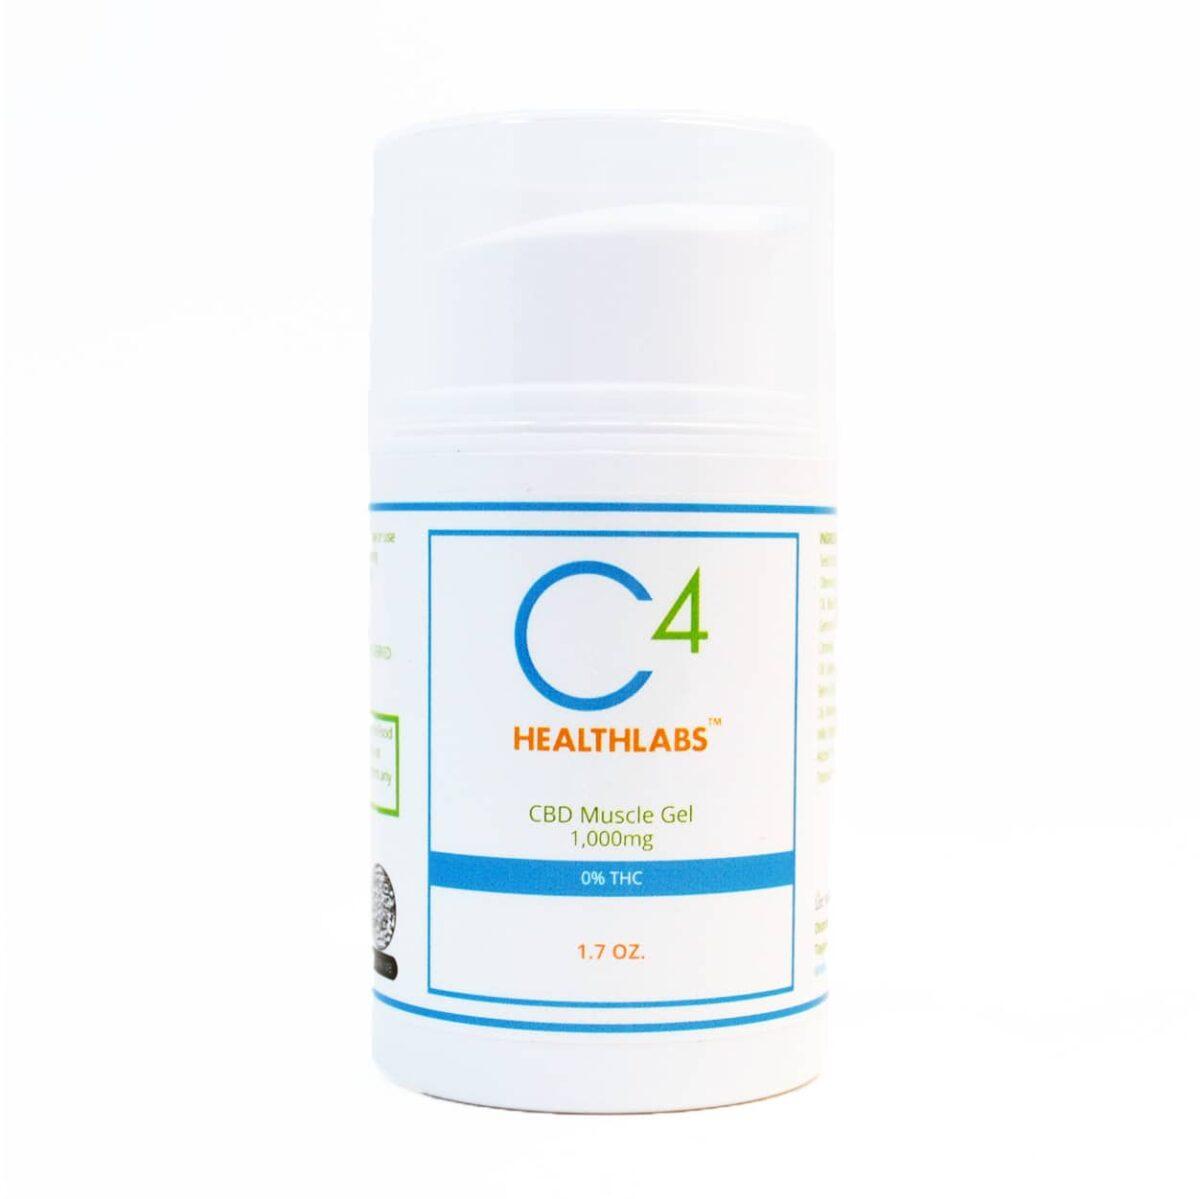 thc free cbd muscle gel